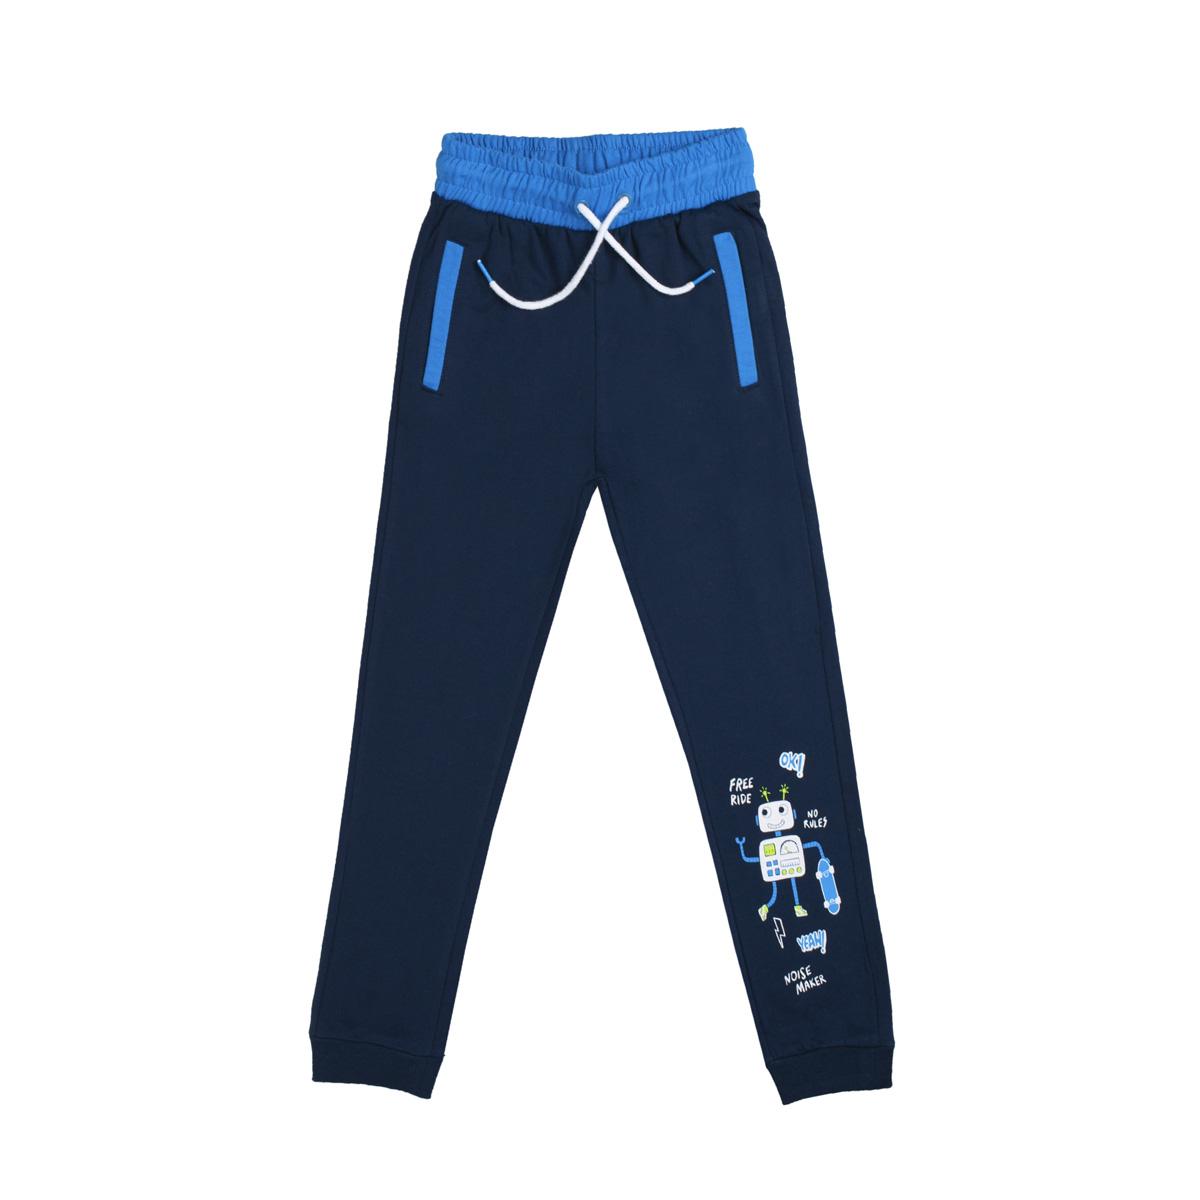 Fantovske hlače, temno modra